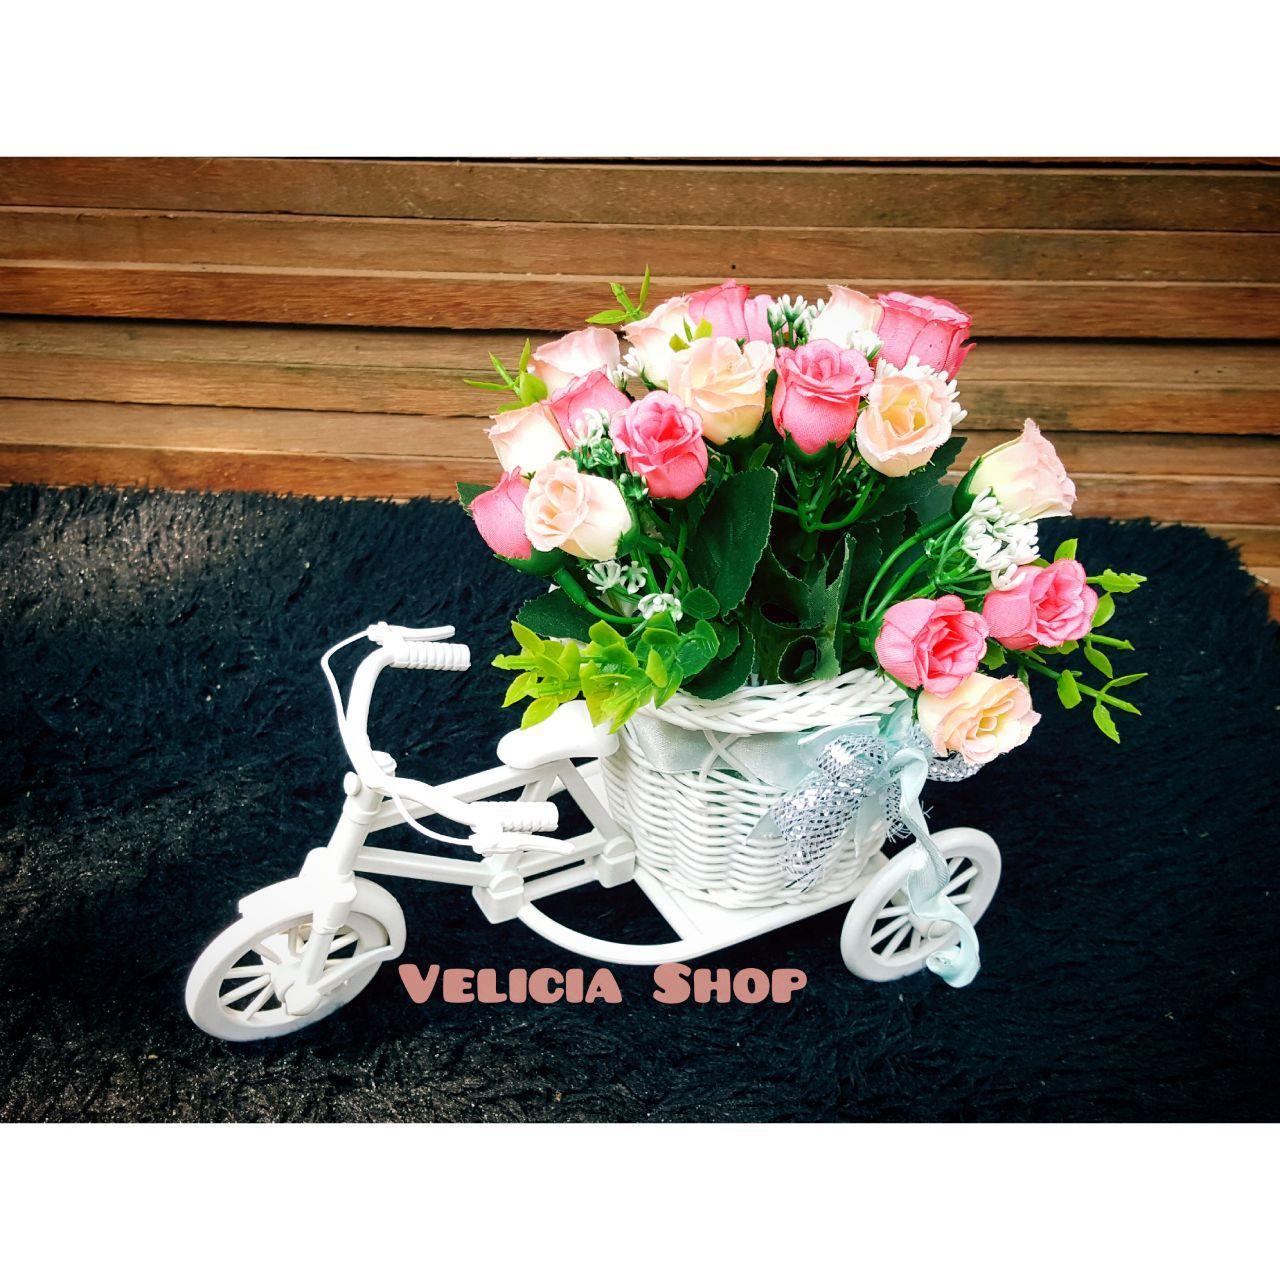 Bunga Pajangan - Bunga Hias Plastik - Bunga Rose -Tanaman artifisial Pot  Sepeda Medium FFL8238 ad72800985